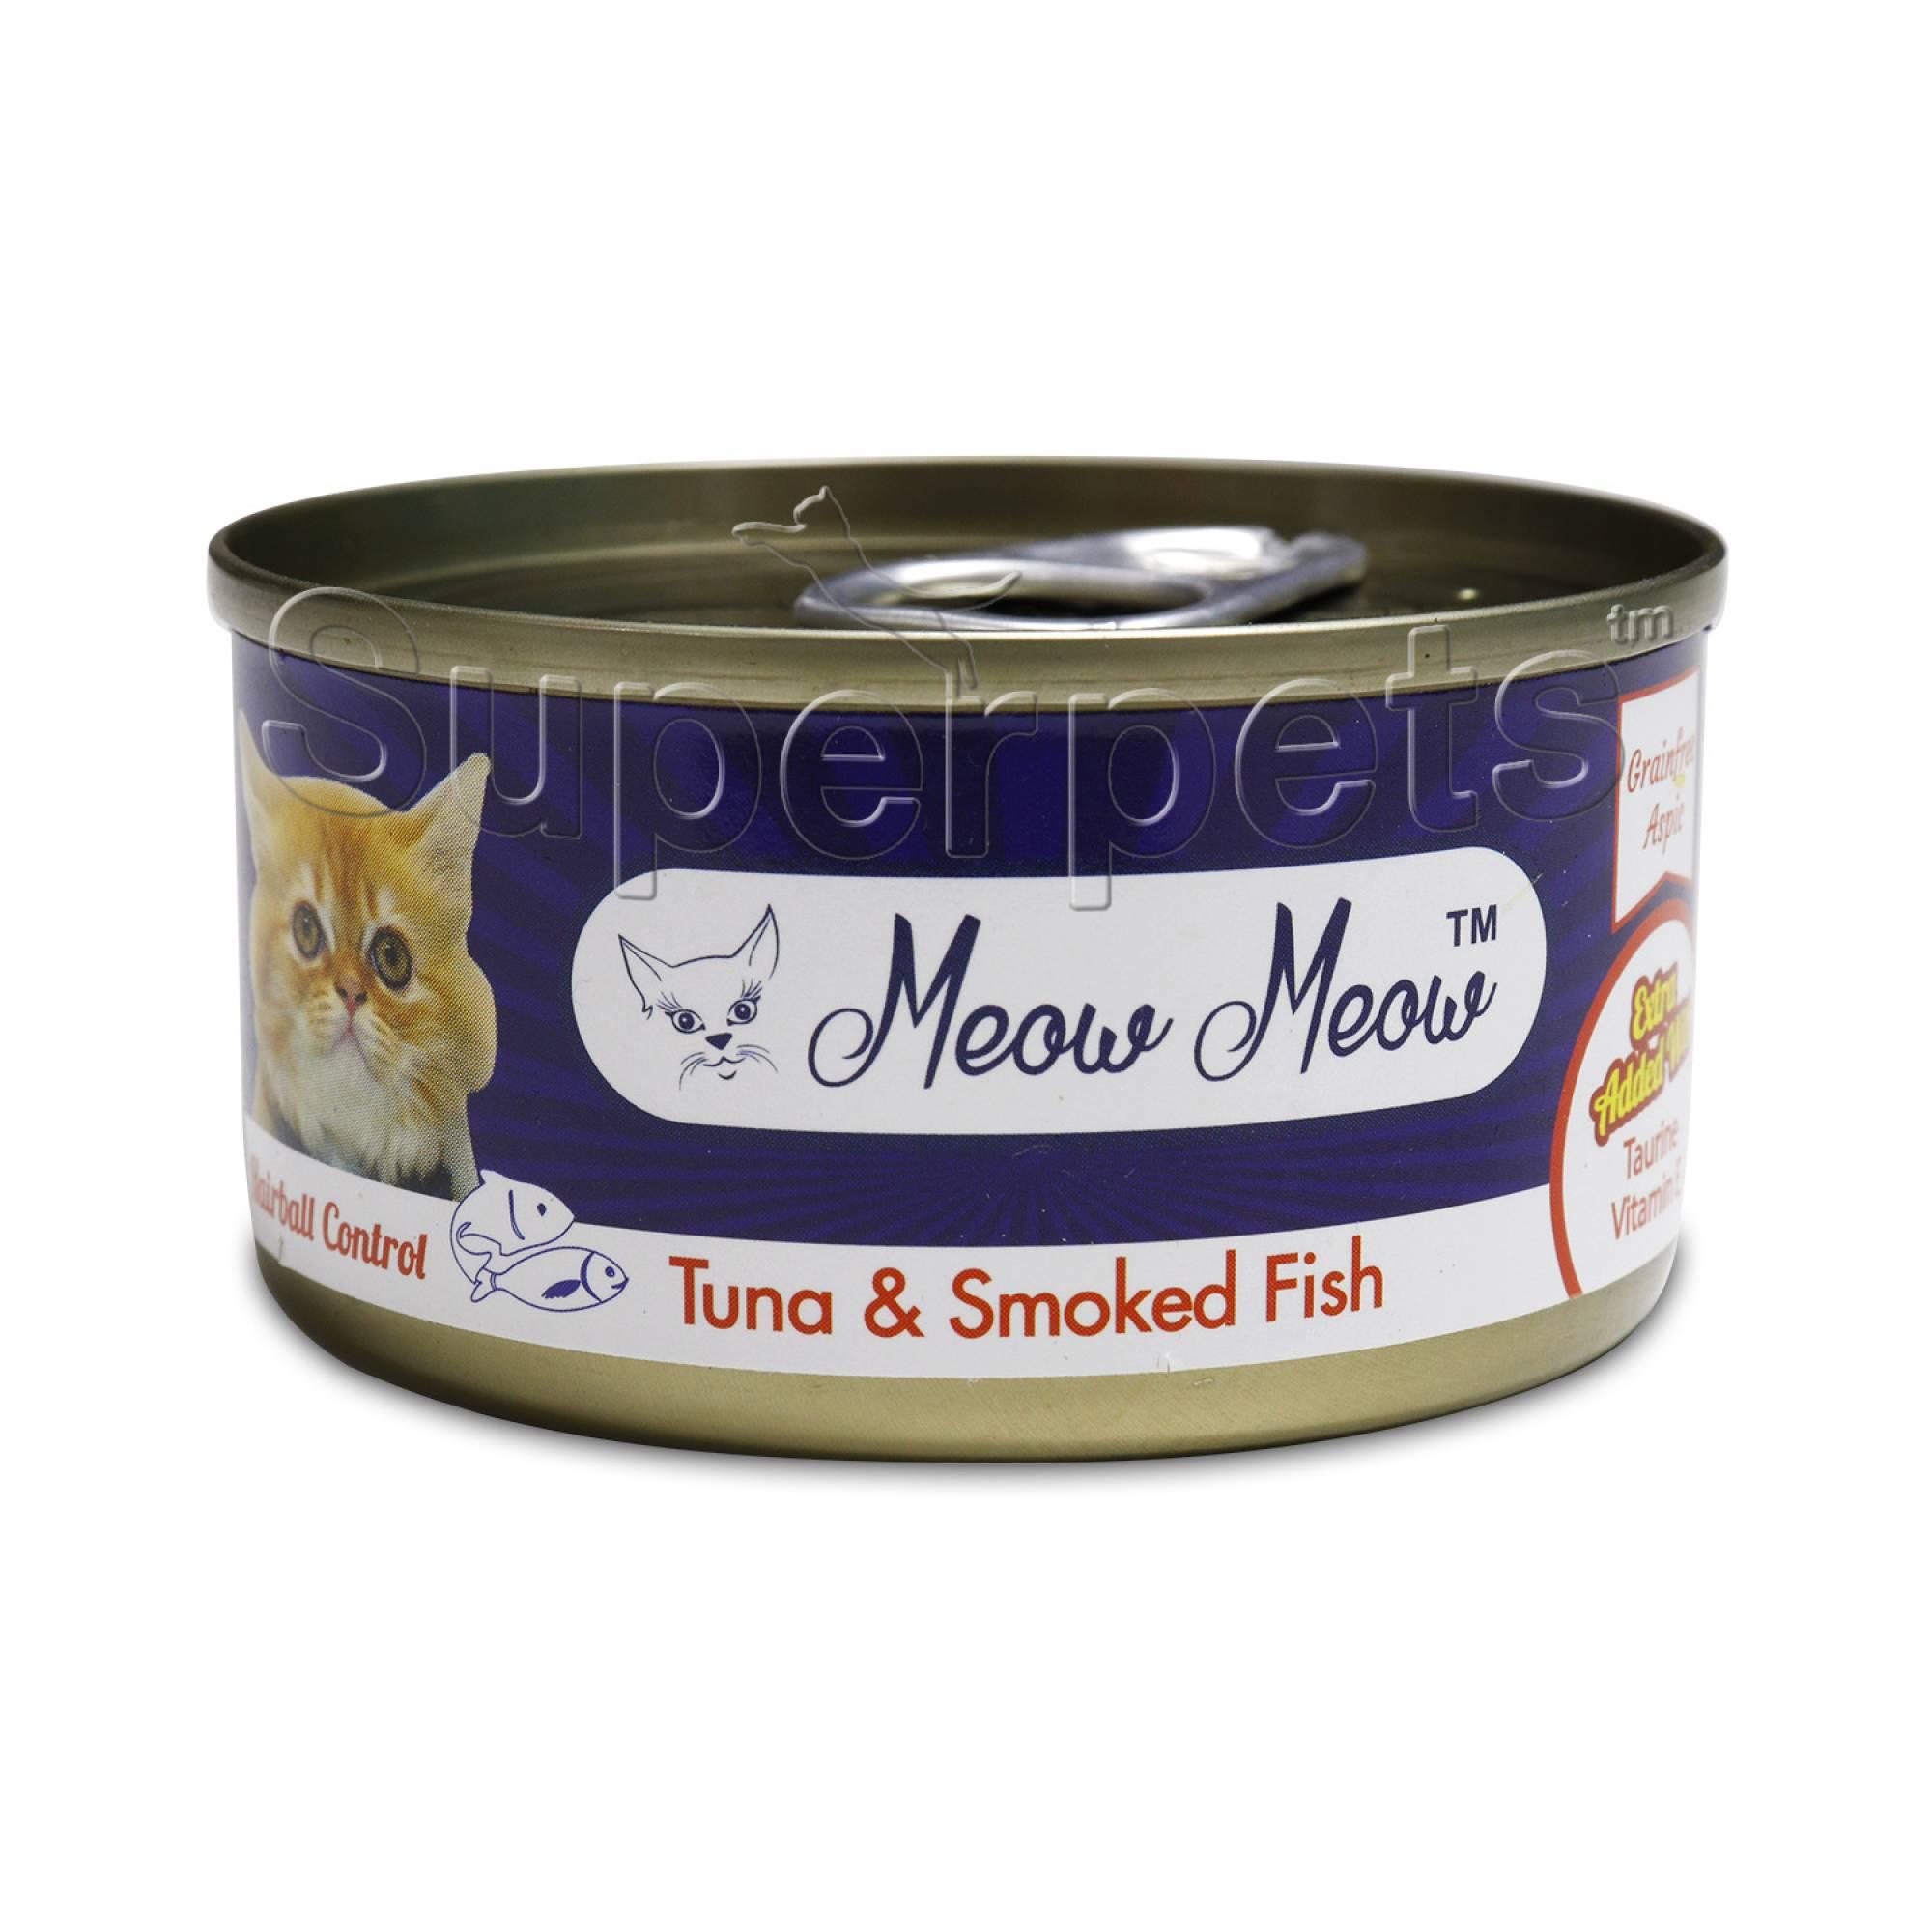 Meow Meow - Tuna & Smoked Fish - Grain Free 80g x 24pcs (1 carton)